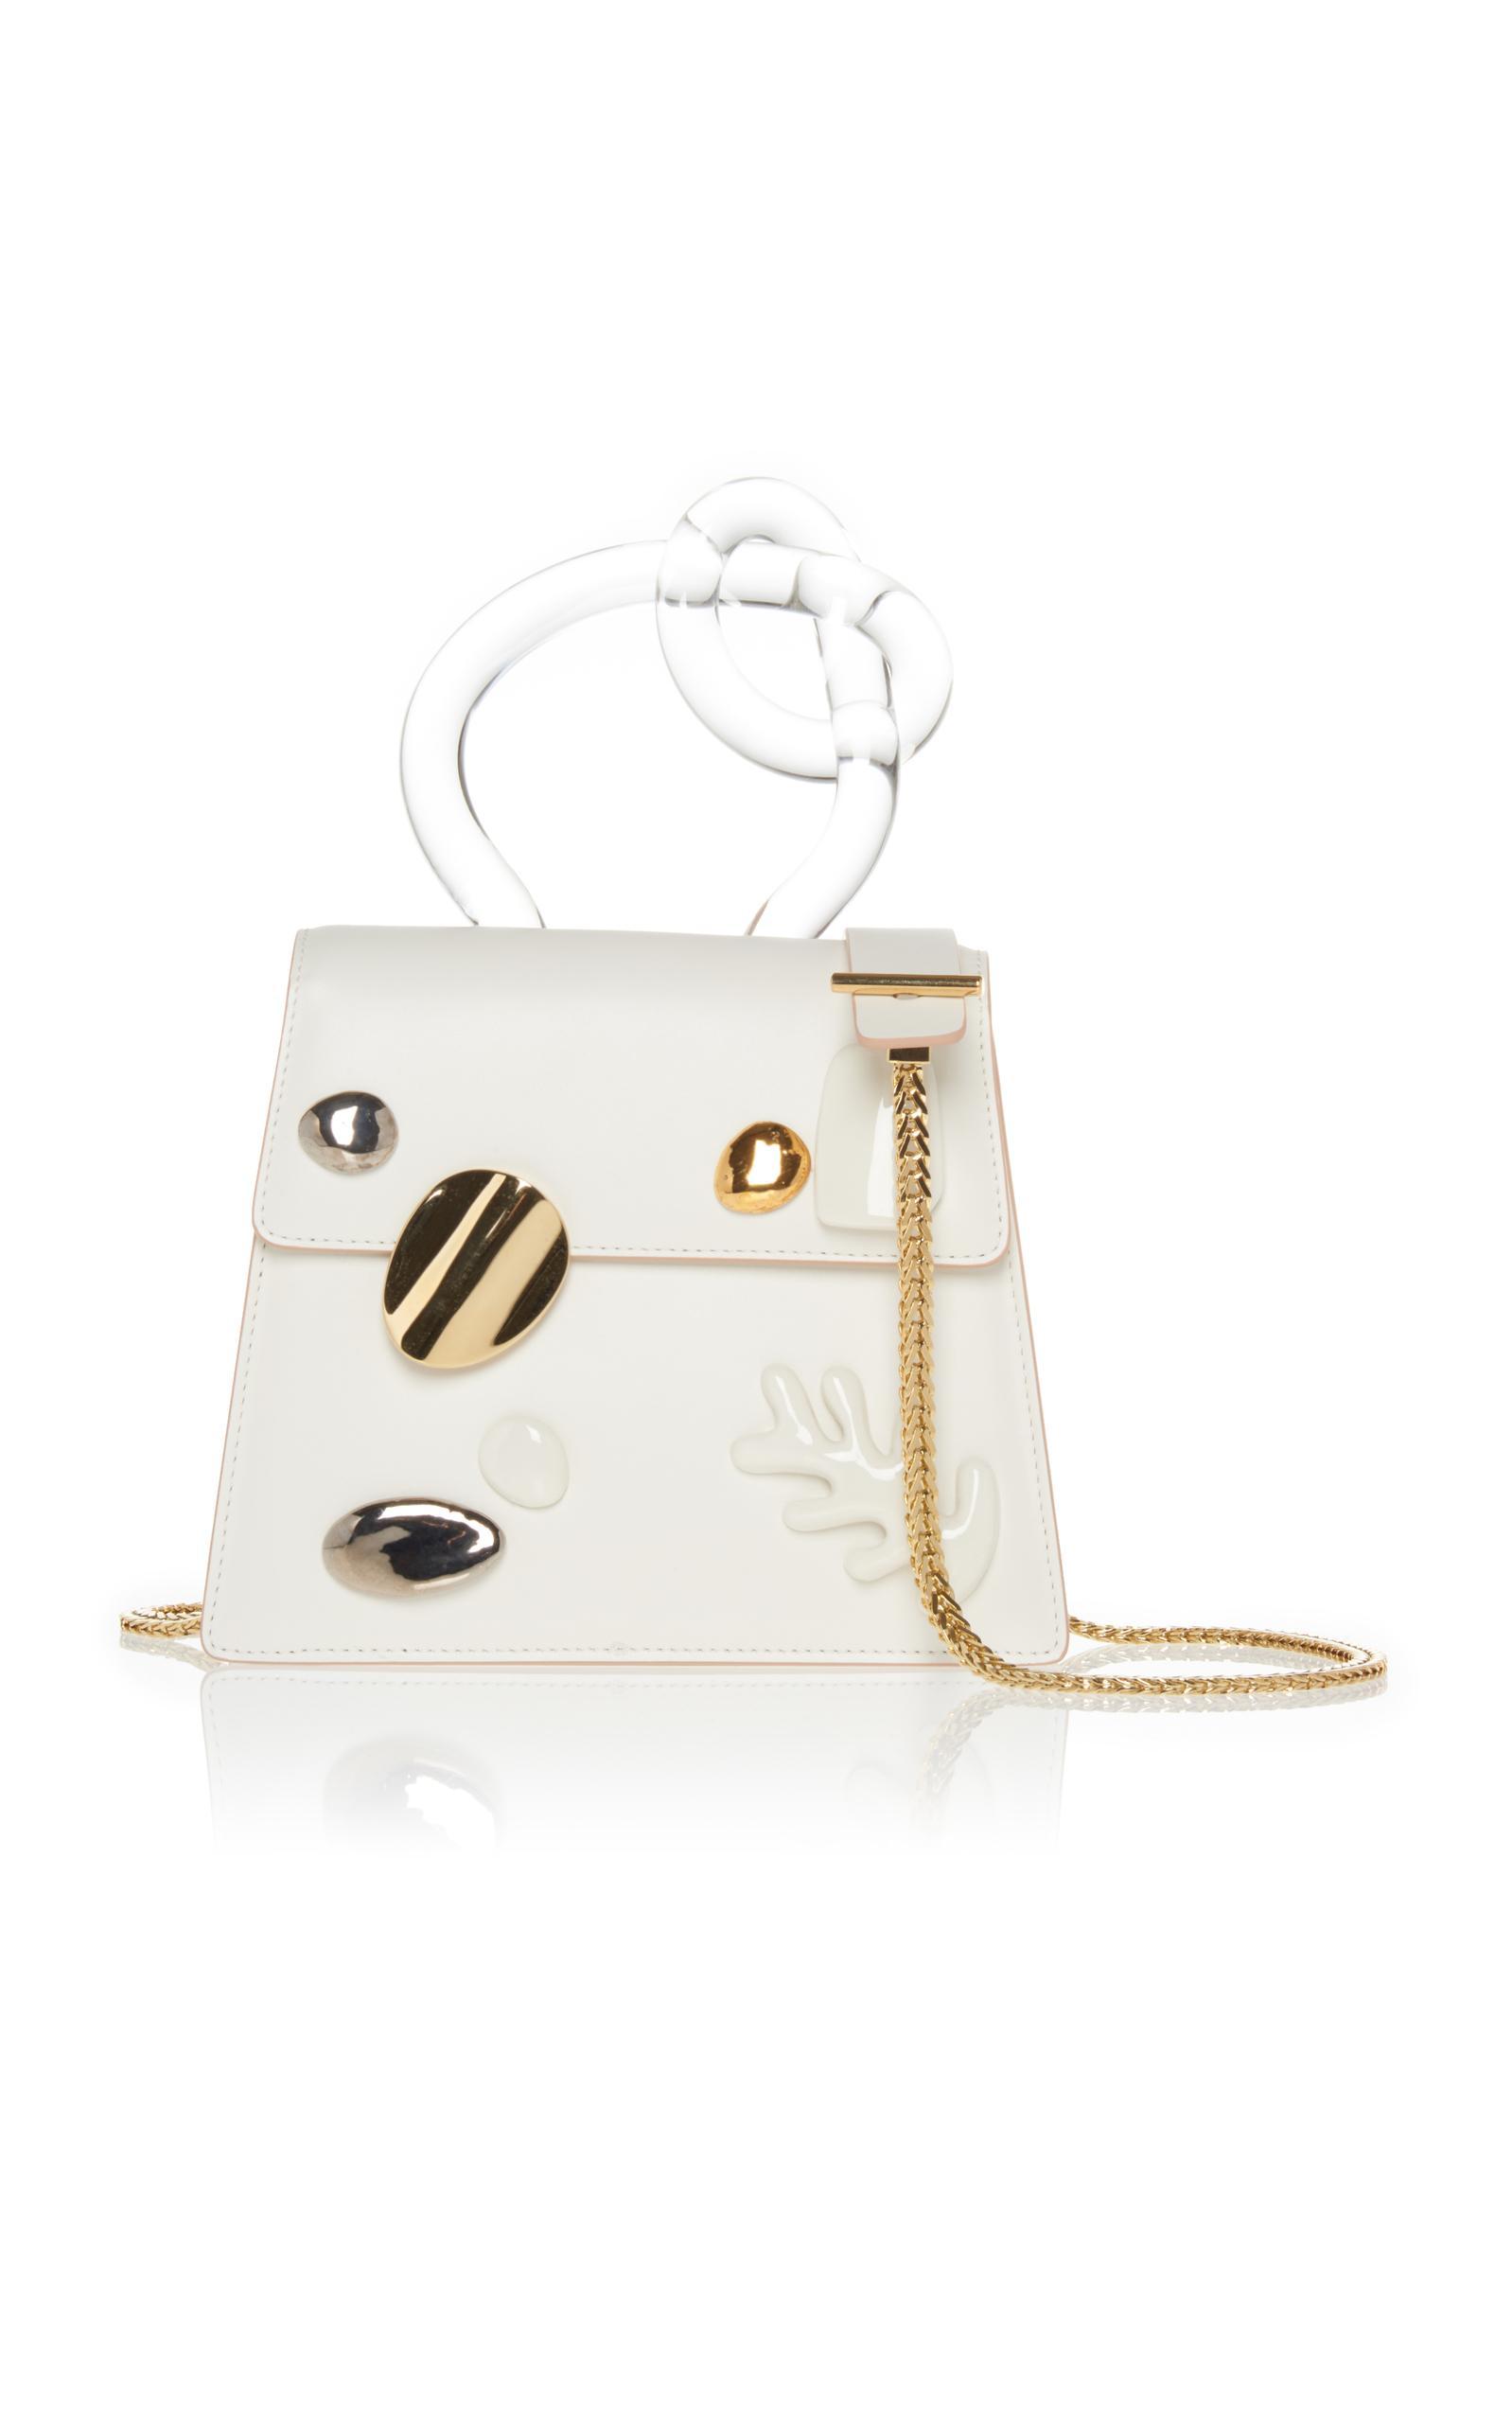 Benedetta Bruzziches Brigitta Top Handle Bag In White